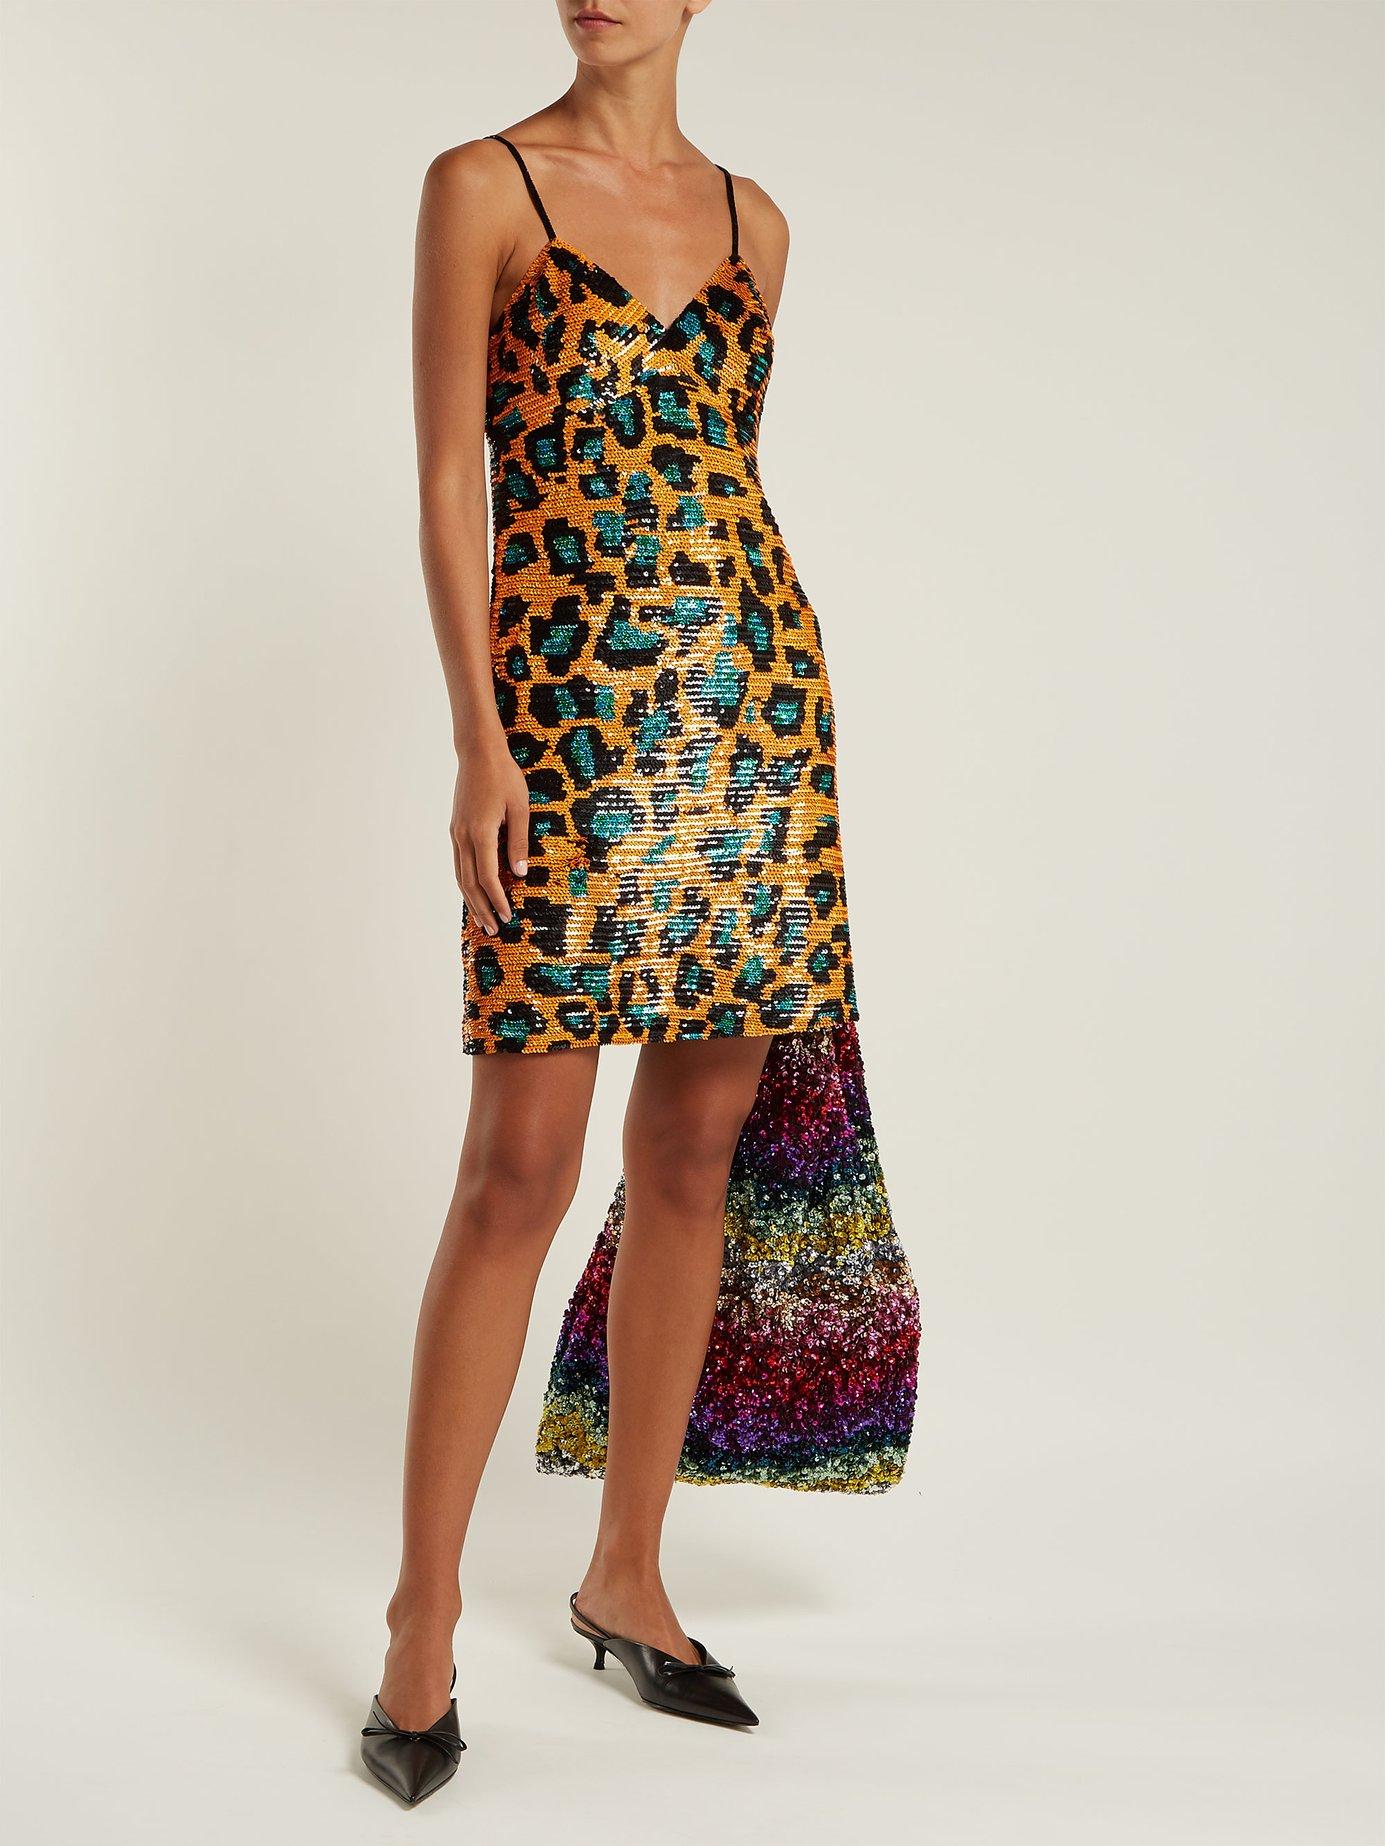 Leopard sequin-embellished georgette mini dress by Ashish